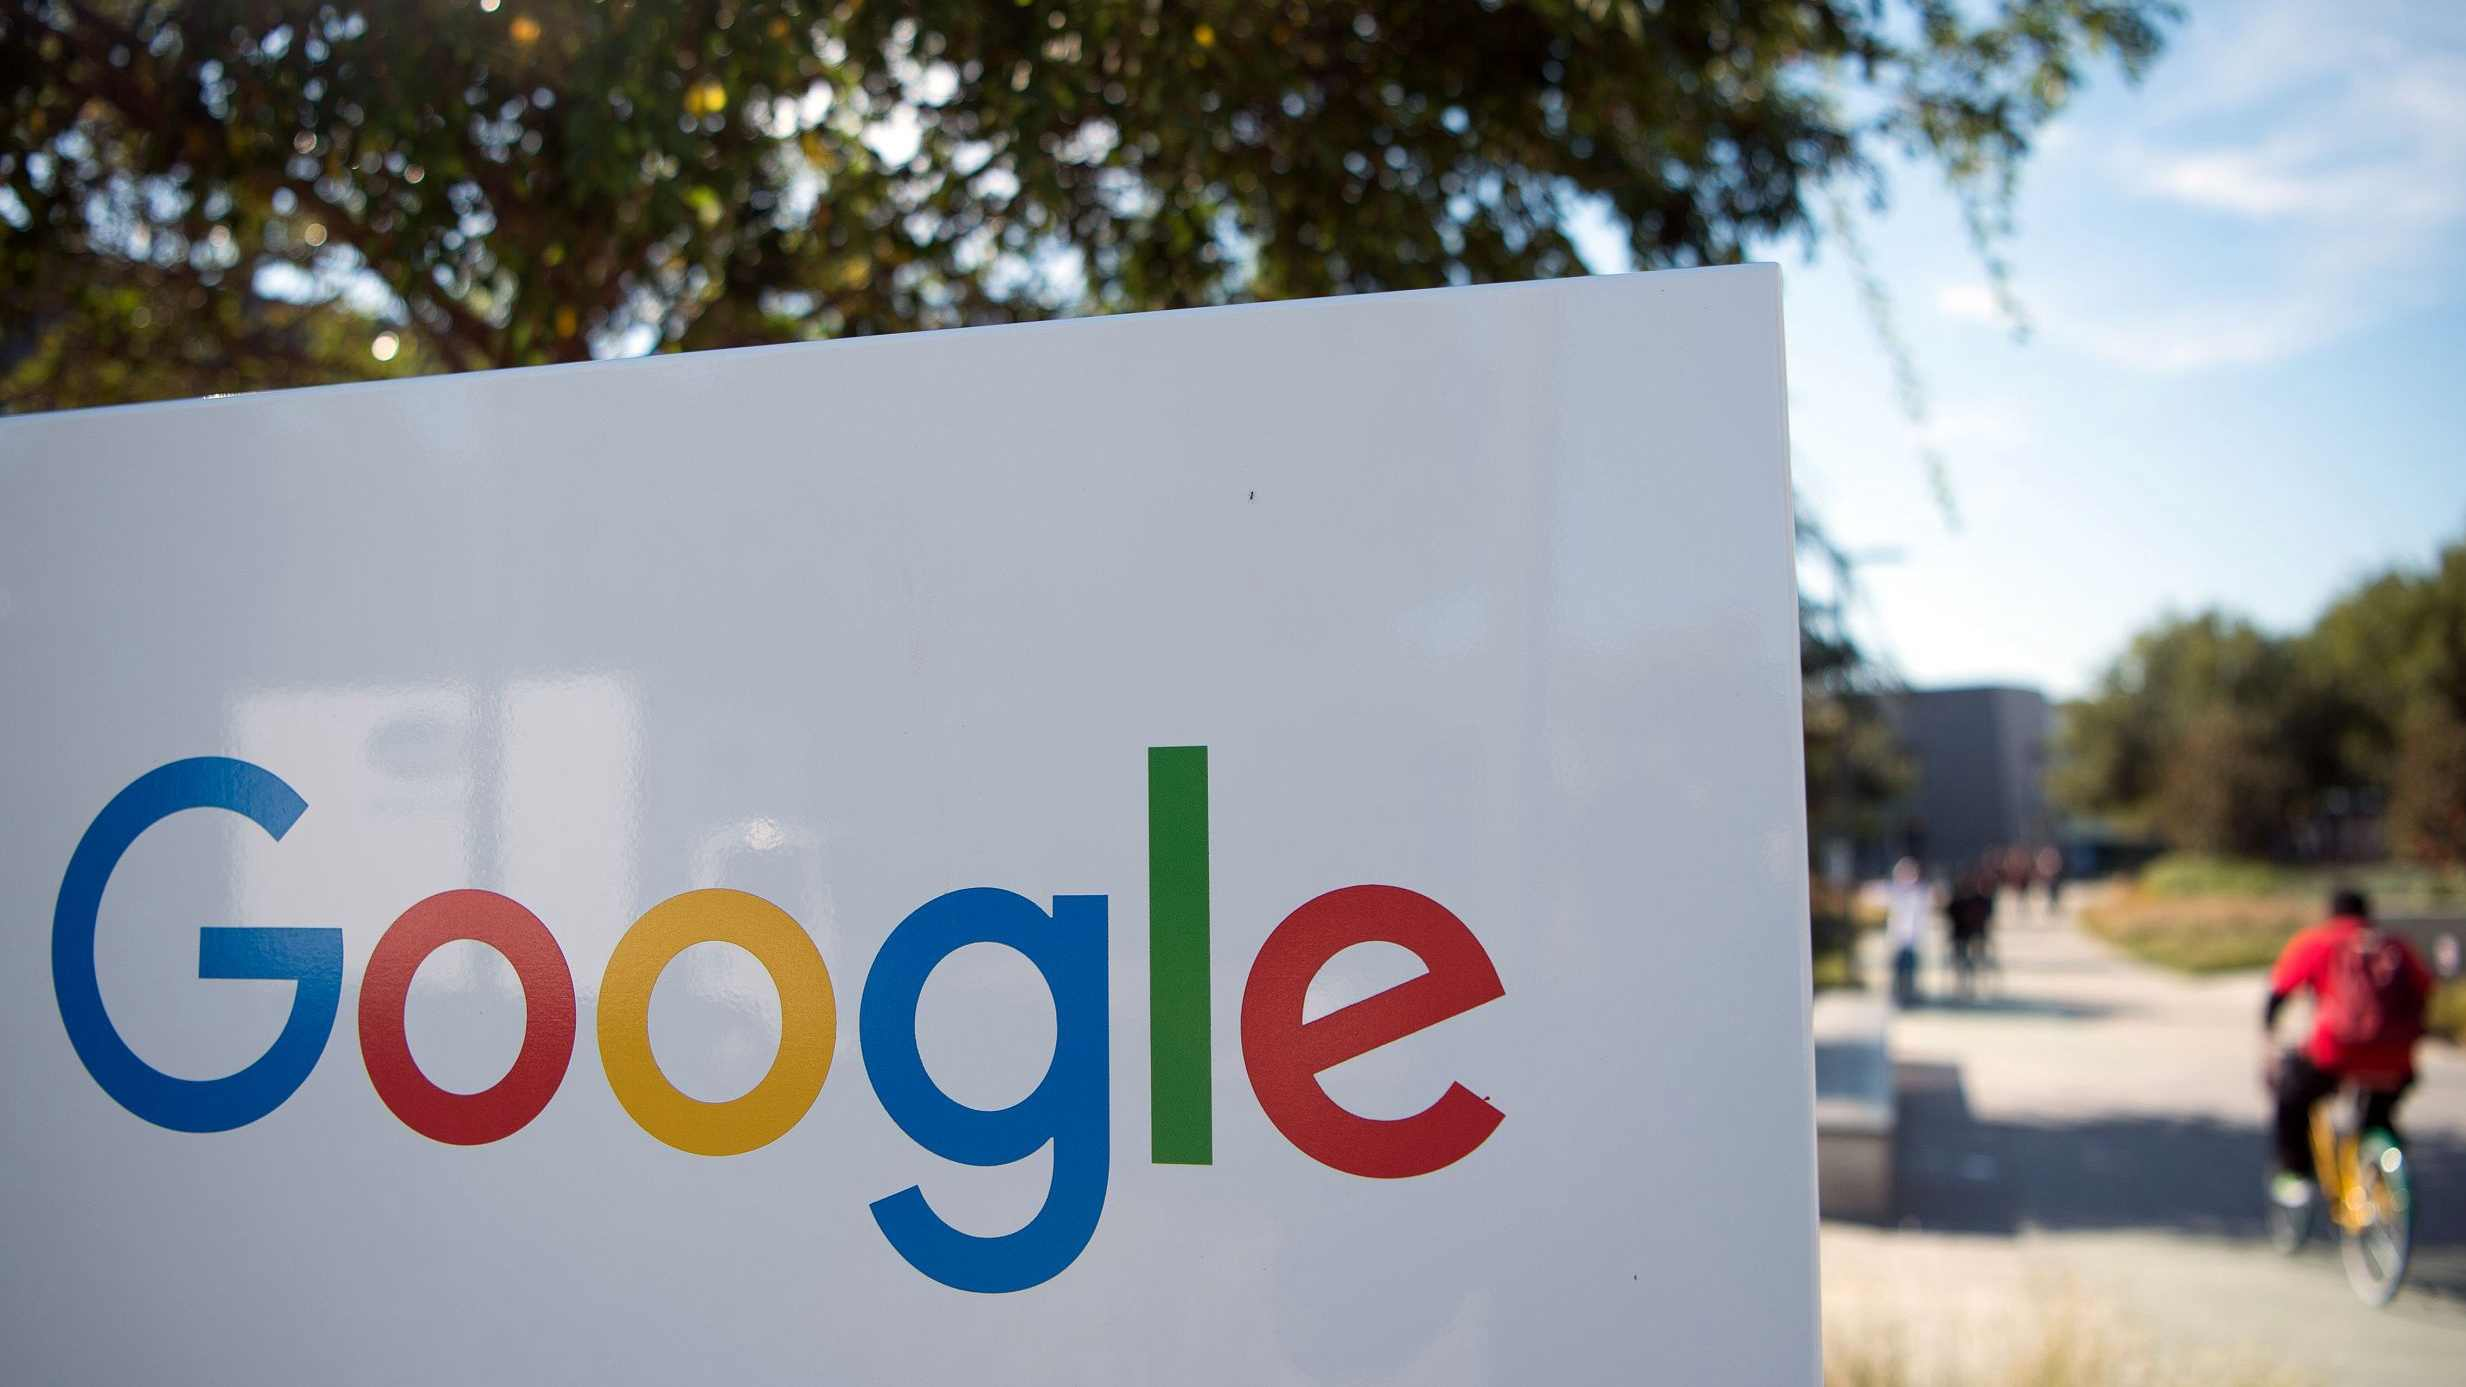 US court sets first hearing on Google antitrust lawsuit